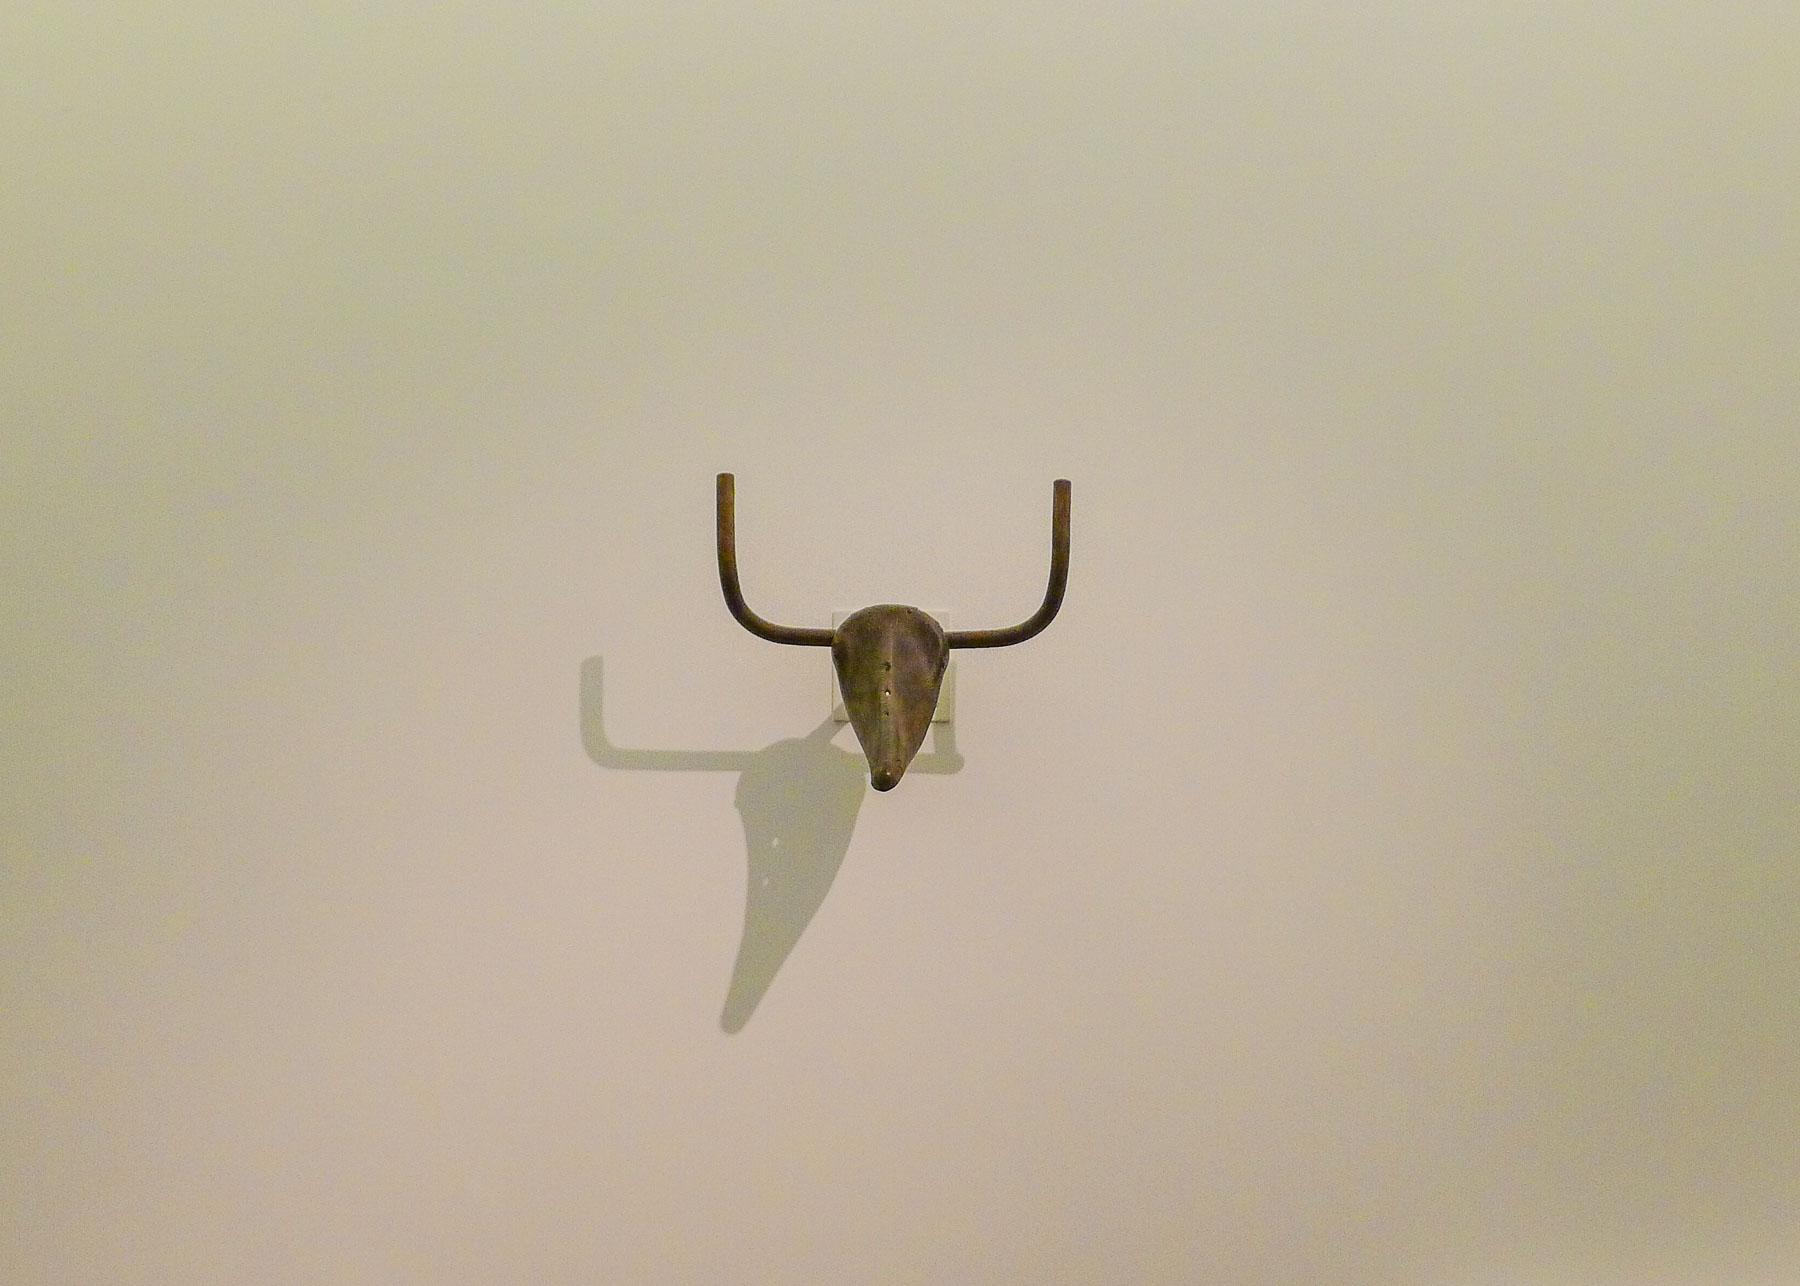 Picasso bull sculpture.